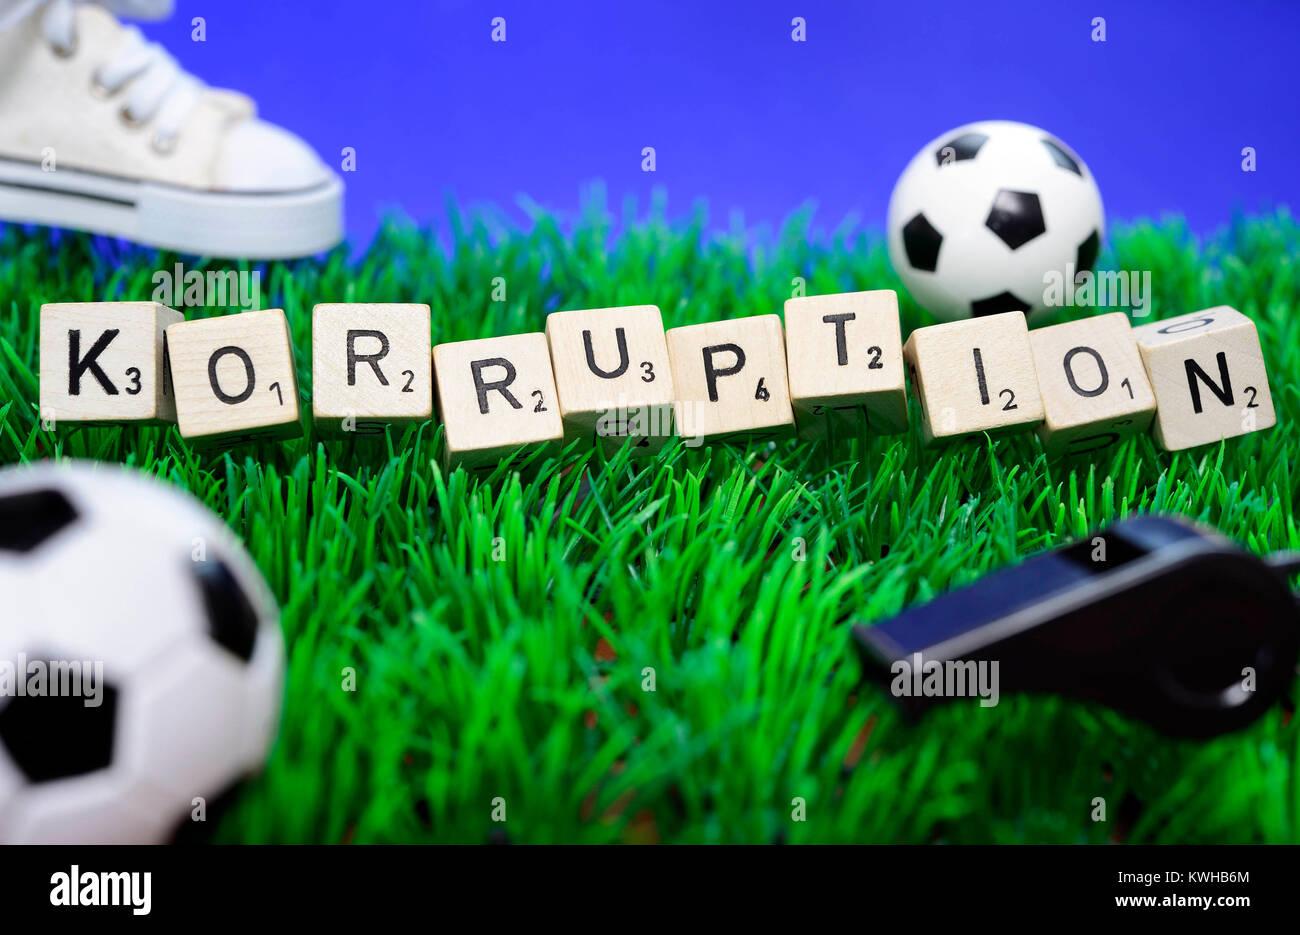 Stroke corruption from cube letter and miniature soccer balls, Fifa scandal, Schriftzug Korruption aus Würfelbuchstaben - Stock Image